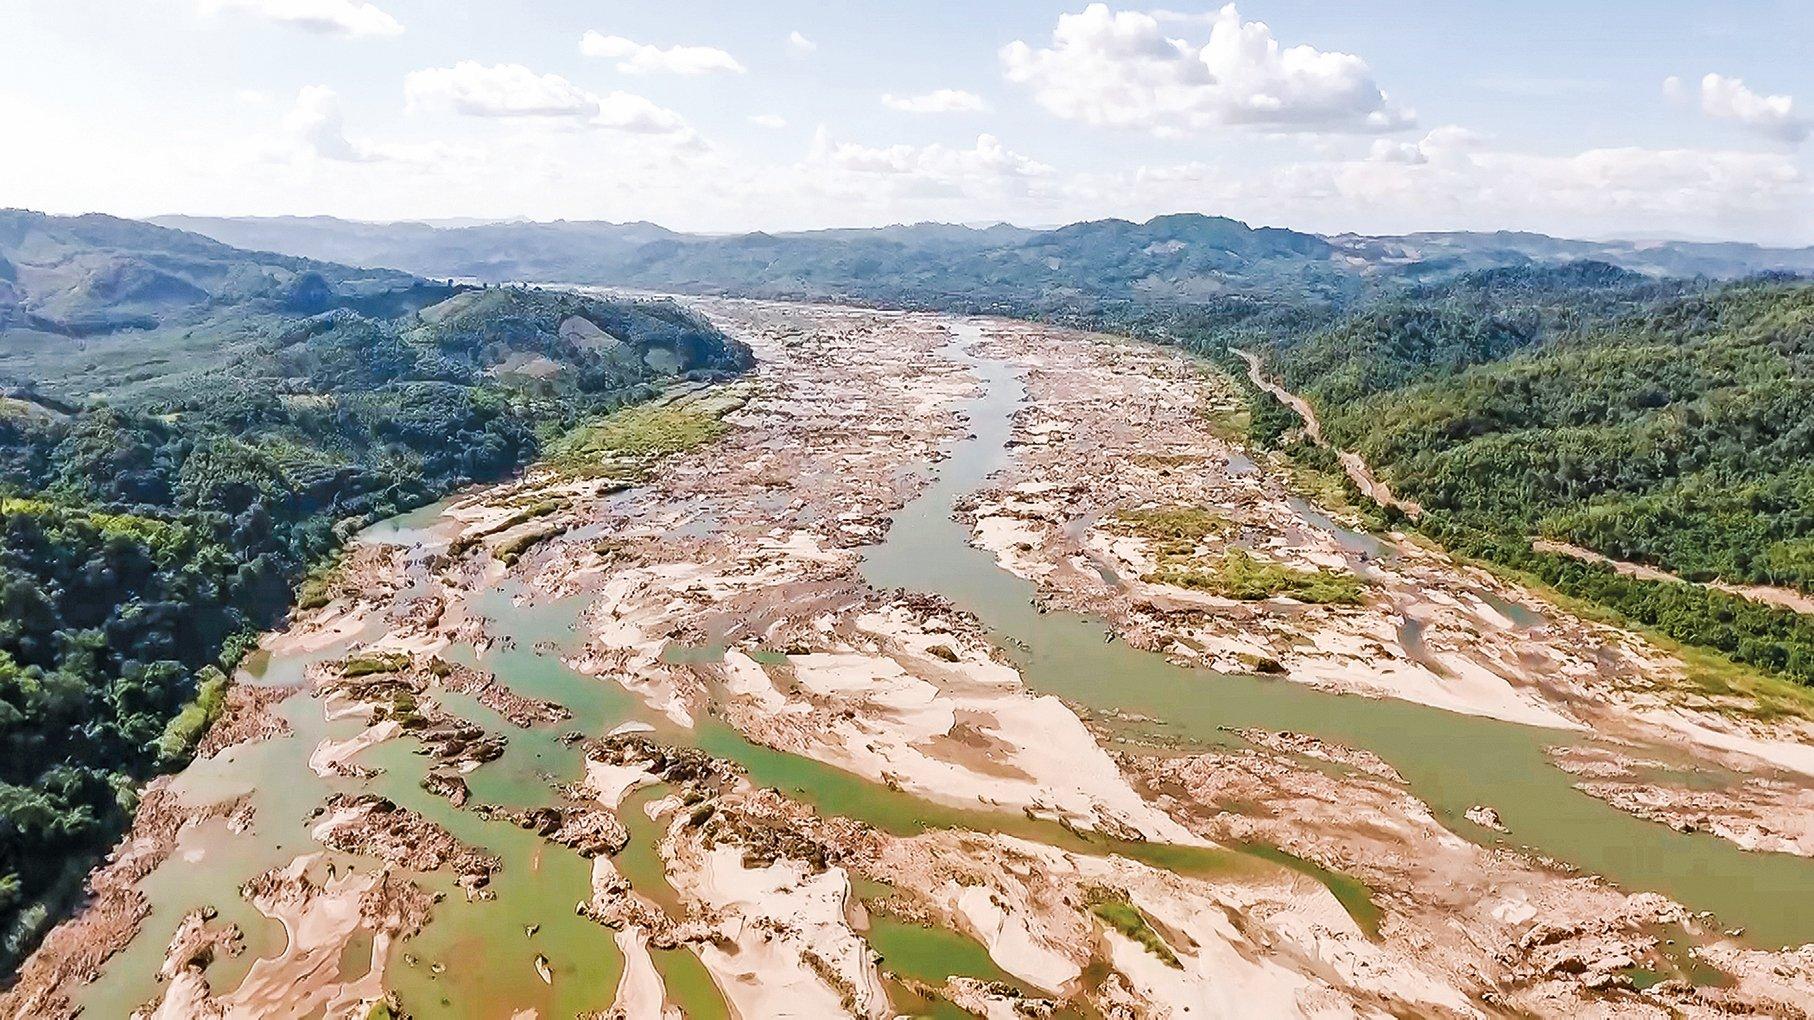 p中國在湄公河上游大肆建壩攔截水源,致使下游多國水域縮減,民生重創。圖為泰國境內的湄公河水源乾枯,河床大面積裸露。(Getty Images)